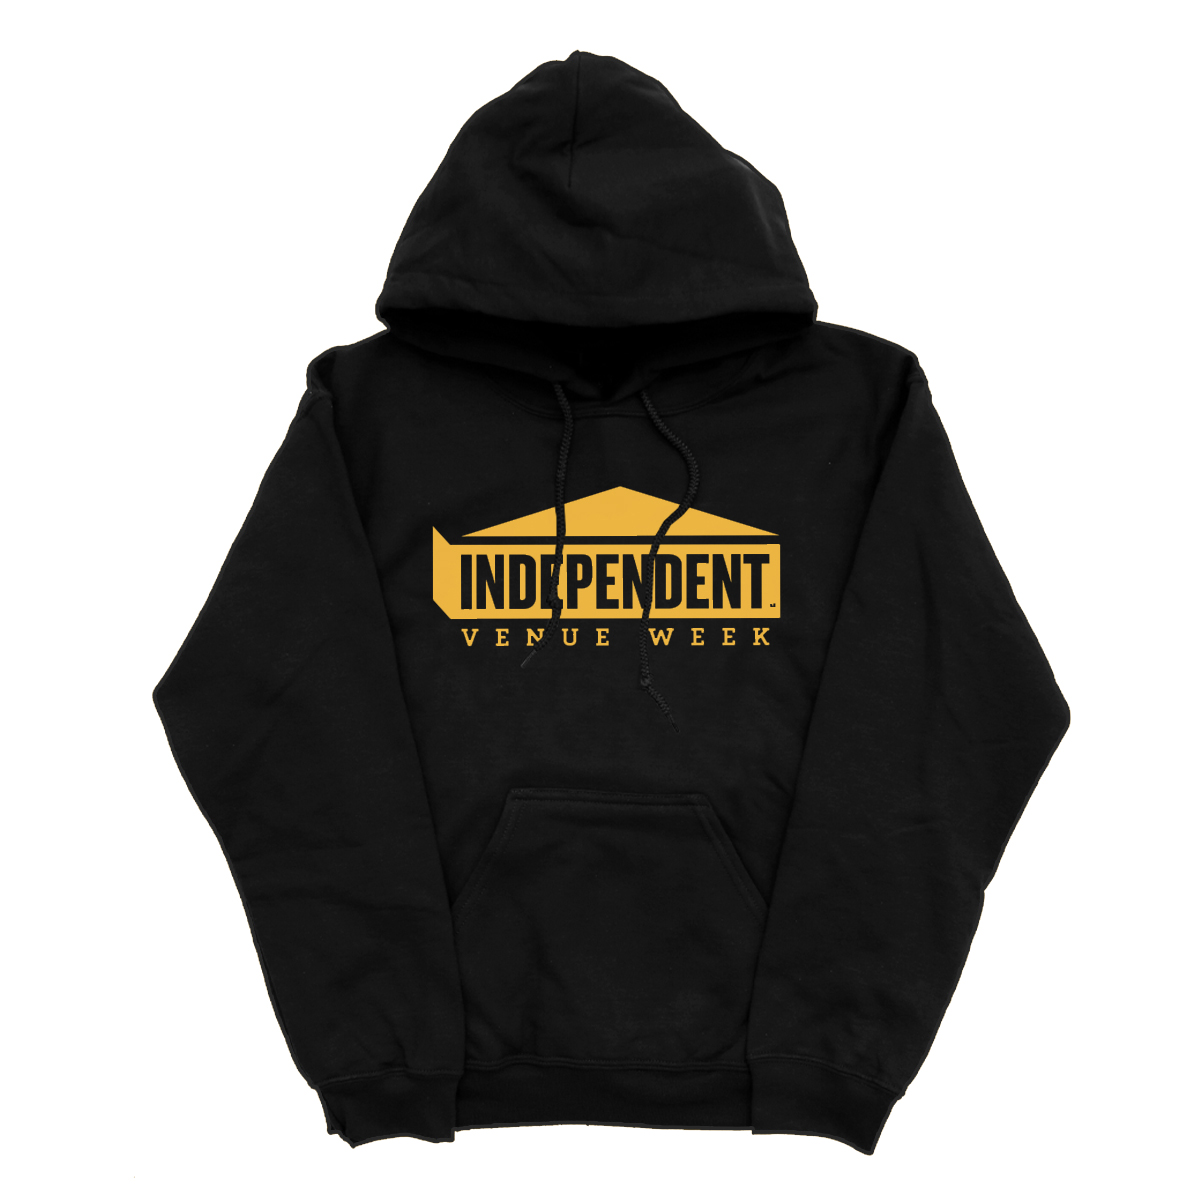 IVW Logo Hoodie (Black w/ Gold)